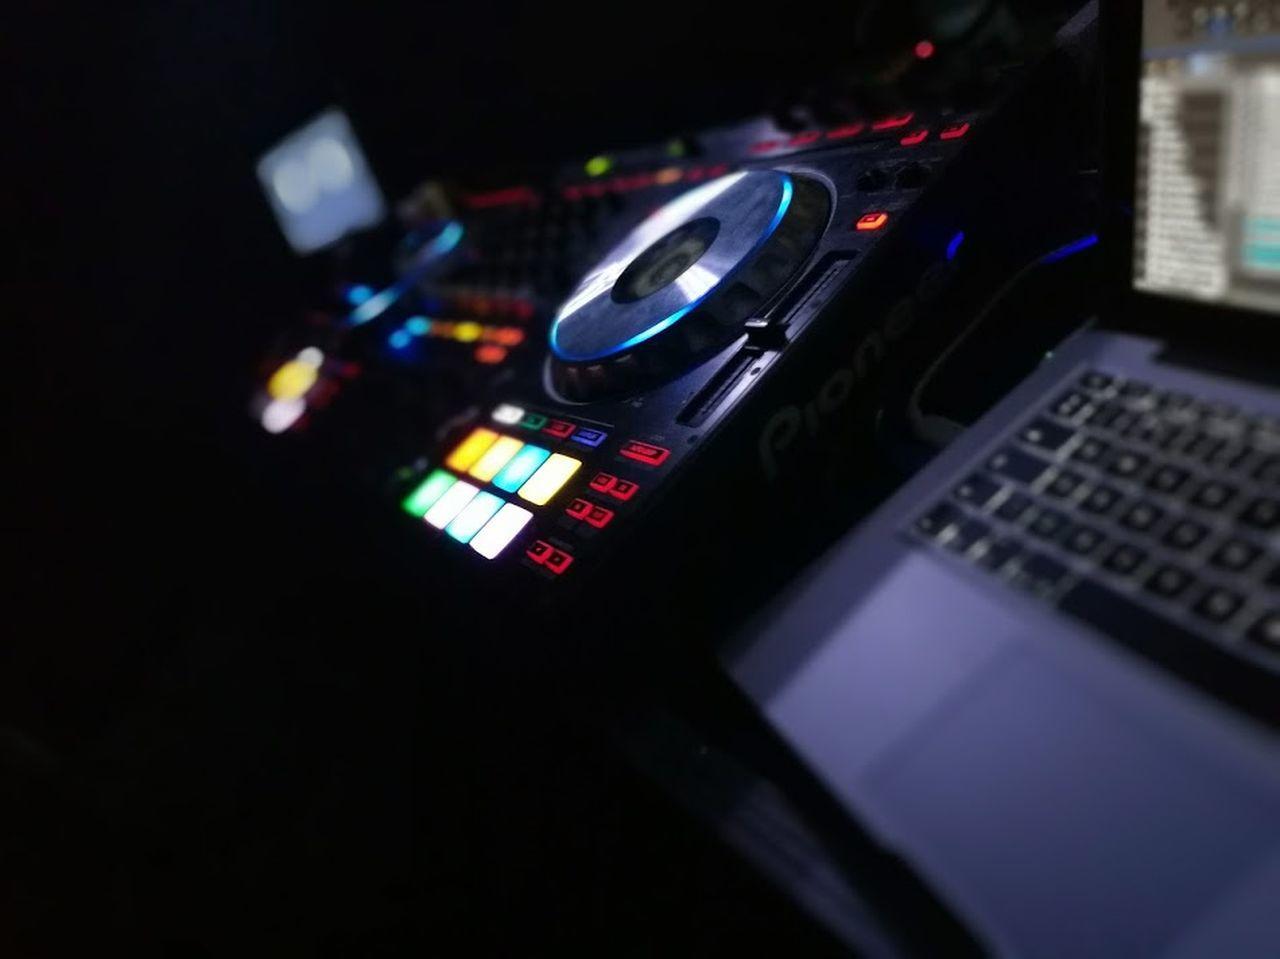 Ddj-sz DJing